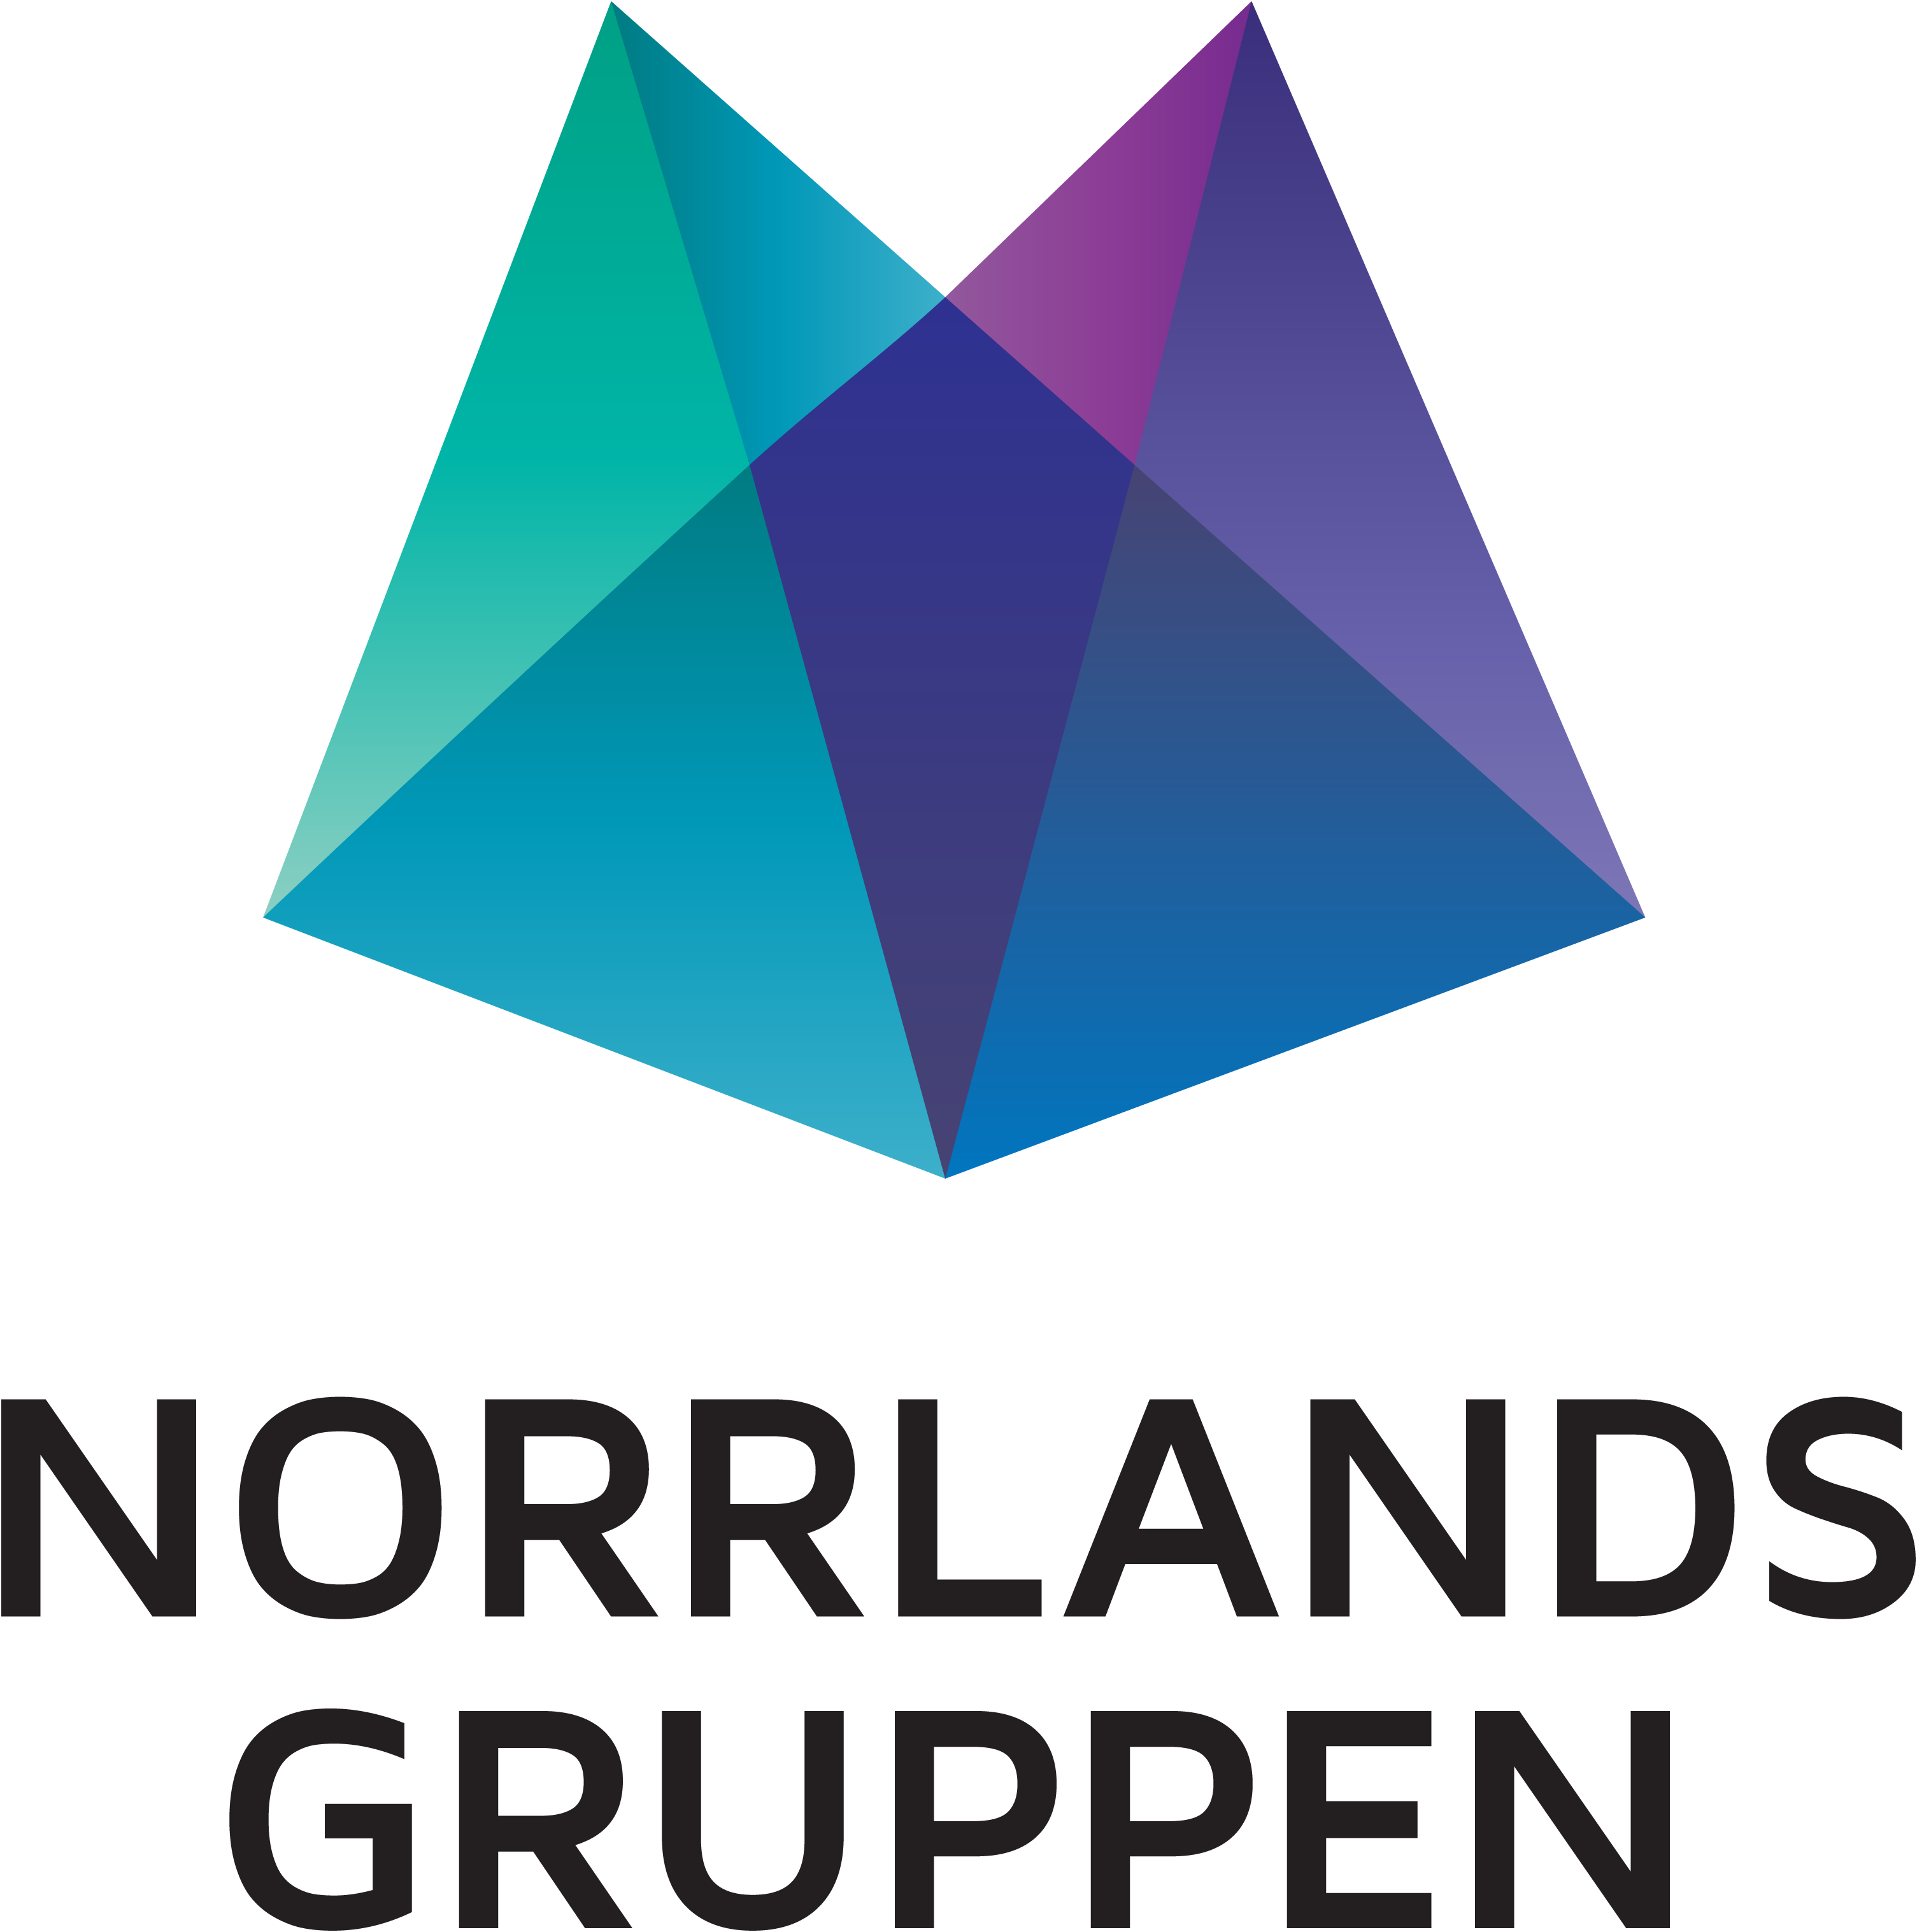 Norrlandsgruppen